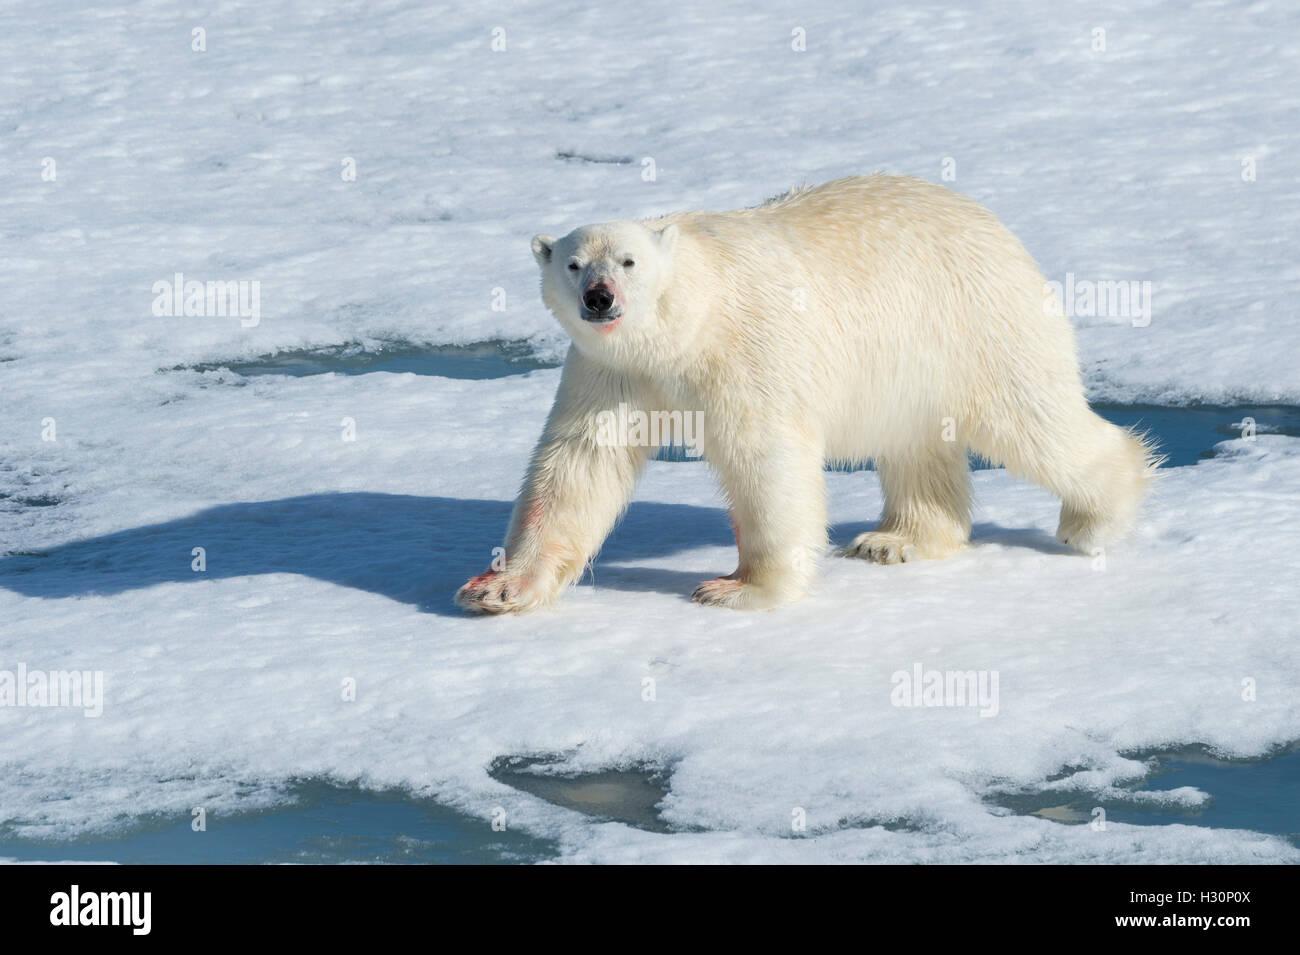 Maschio di Orso Polare (Ursus maritimus) passeggiate sulla banchisa, isola Spitsbergen, arcipelago delle Svalbard, Immagini Stock